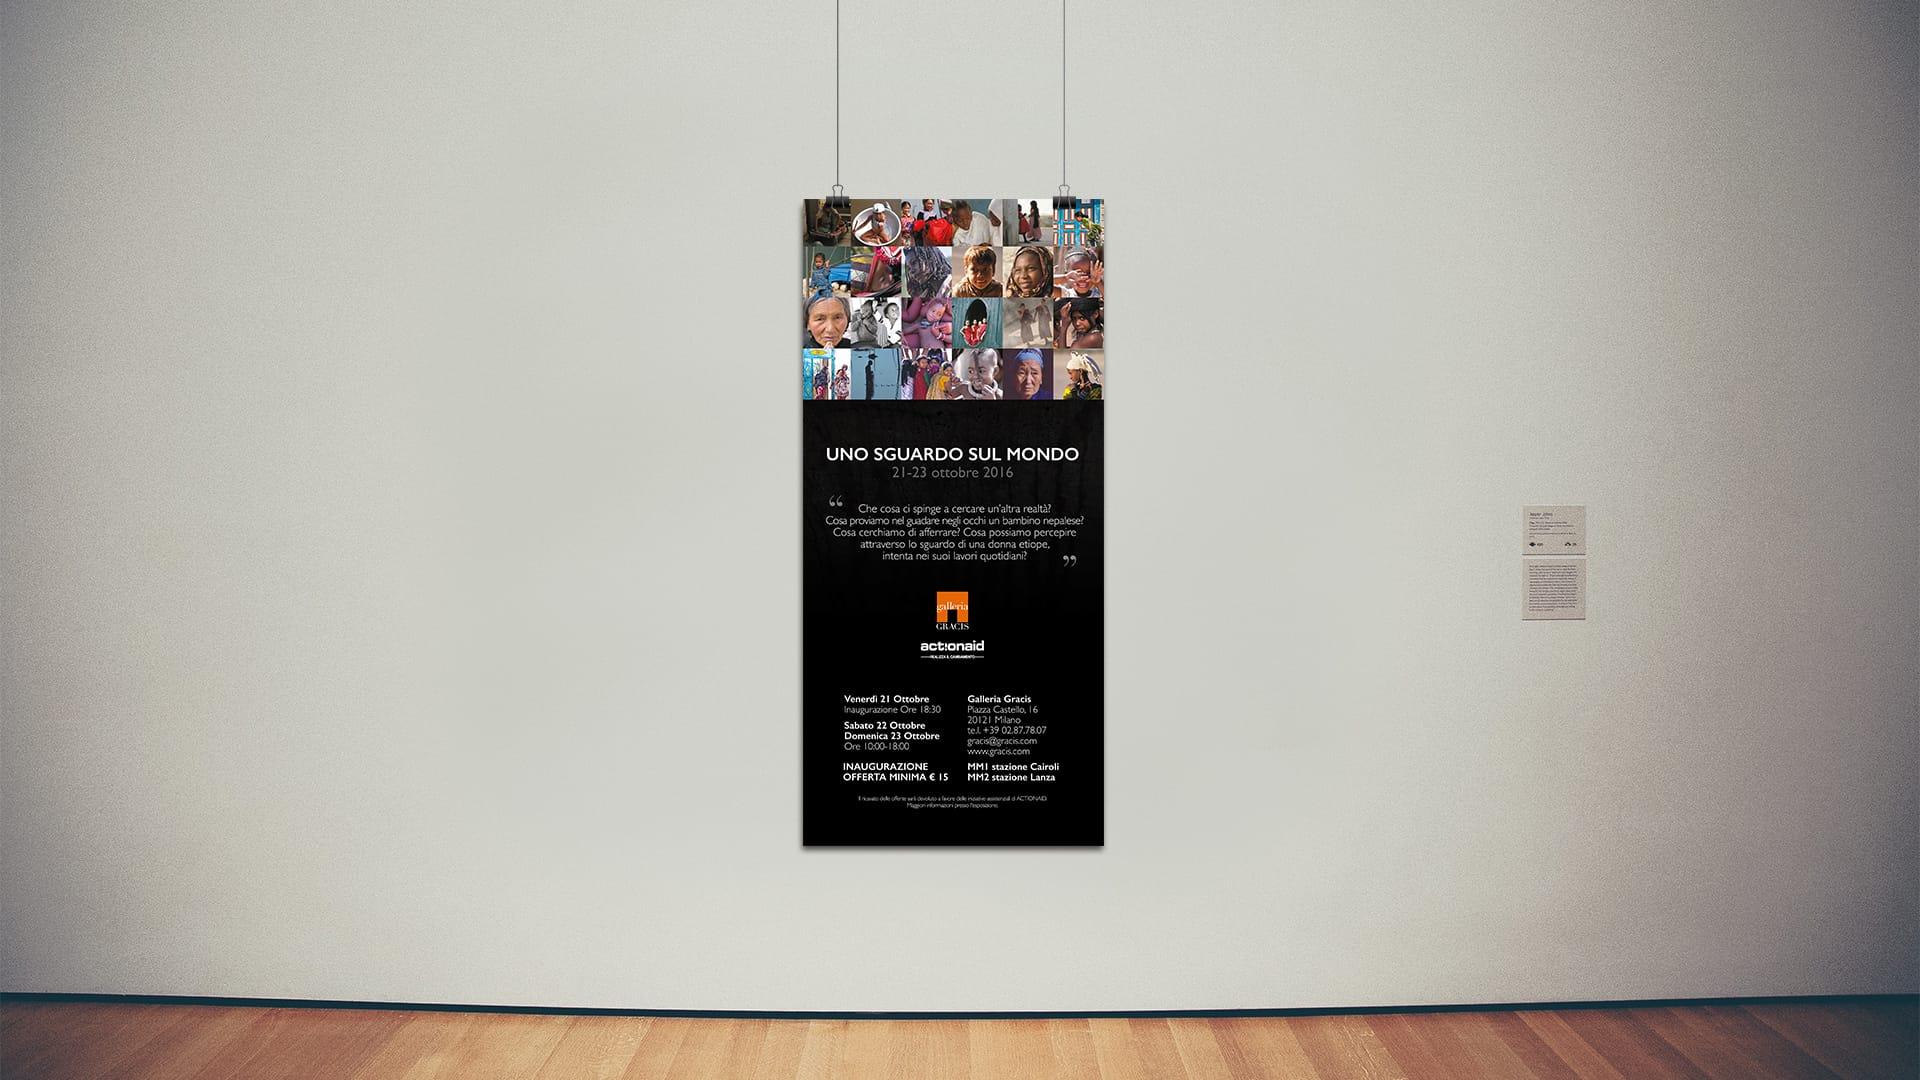 actionaid-portfolio-grafica-wall-stendardo